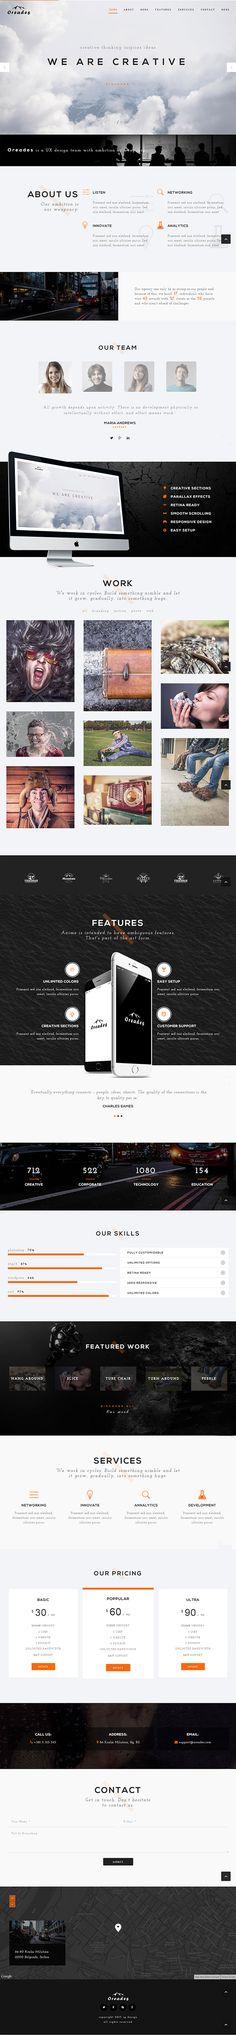 Oreades – Creative One-Page WordPress Theme #html5 #responsivedesign #wordpressthemes #wordpresstemplates